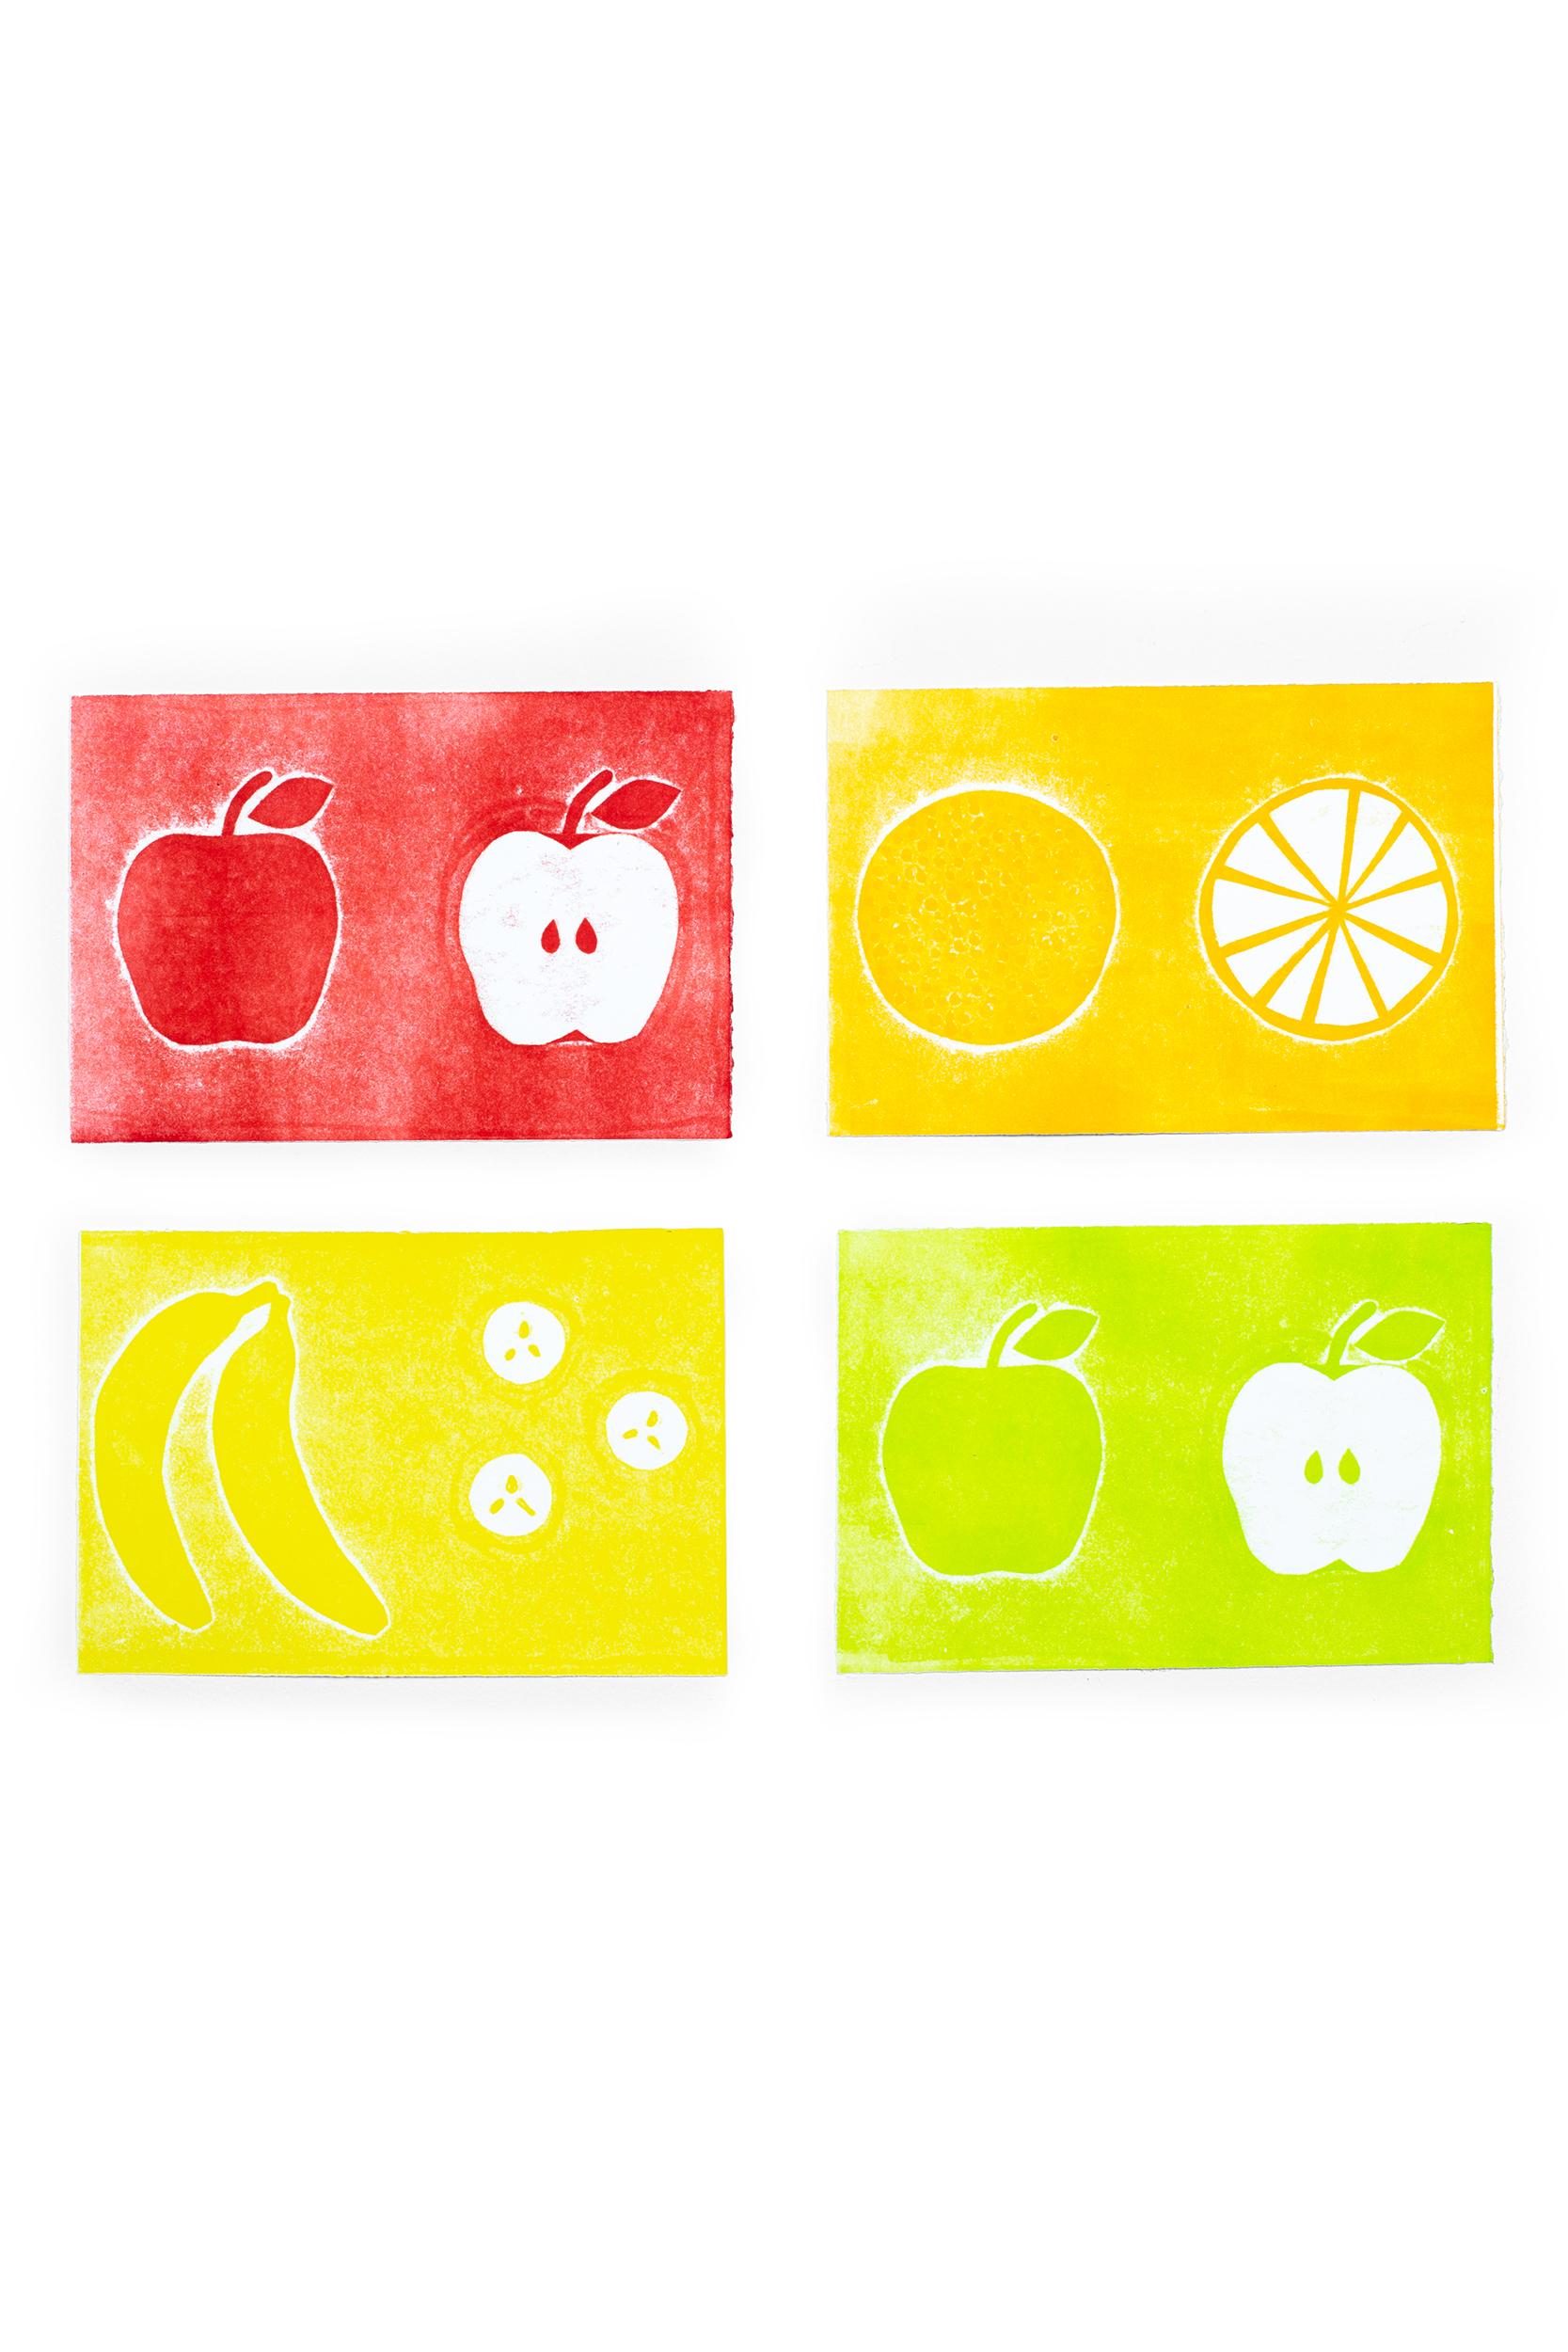 Fruit Prints copy.jpg